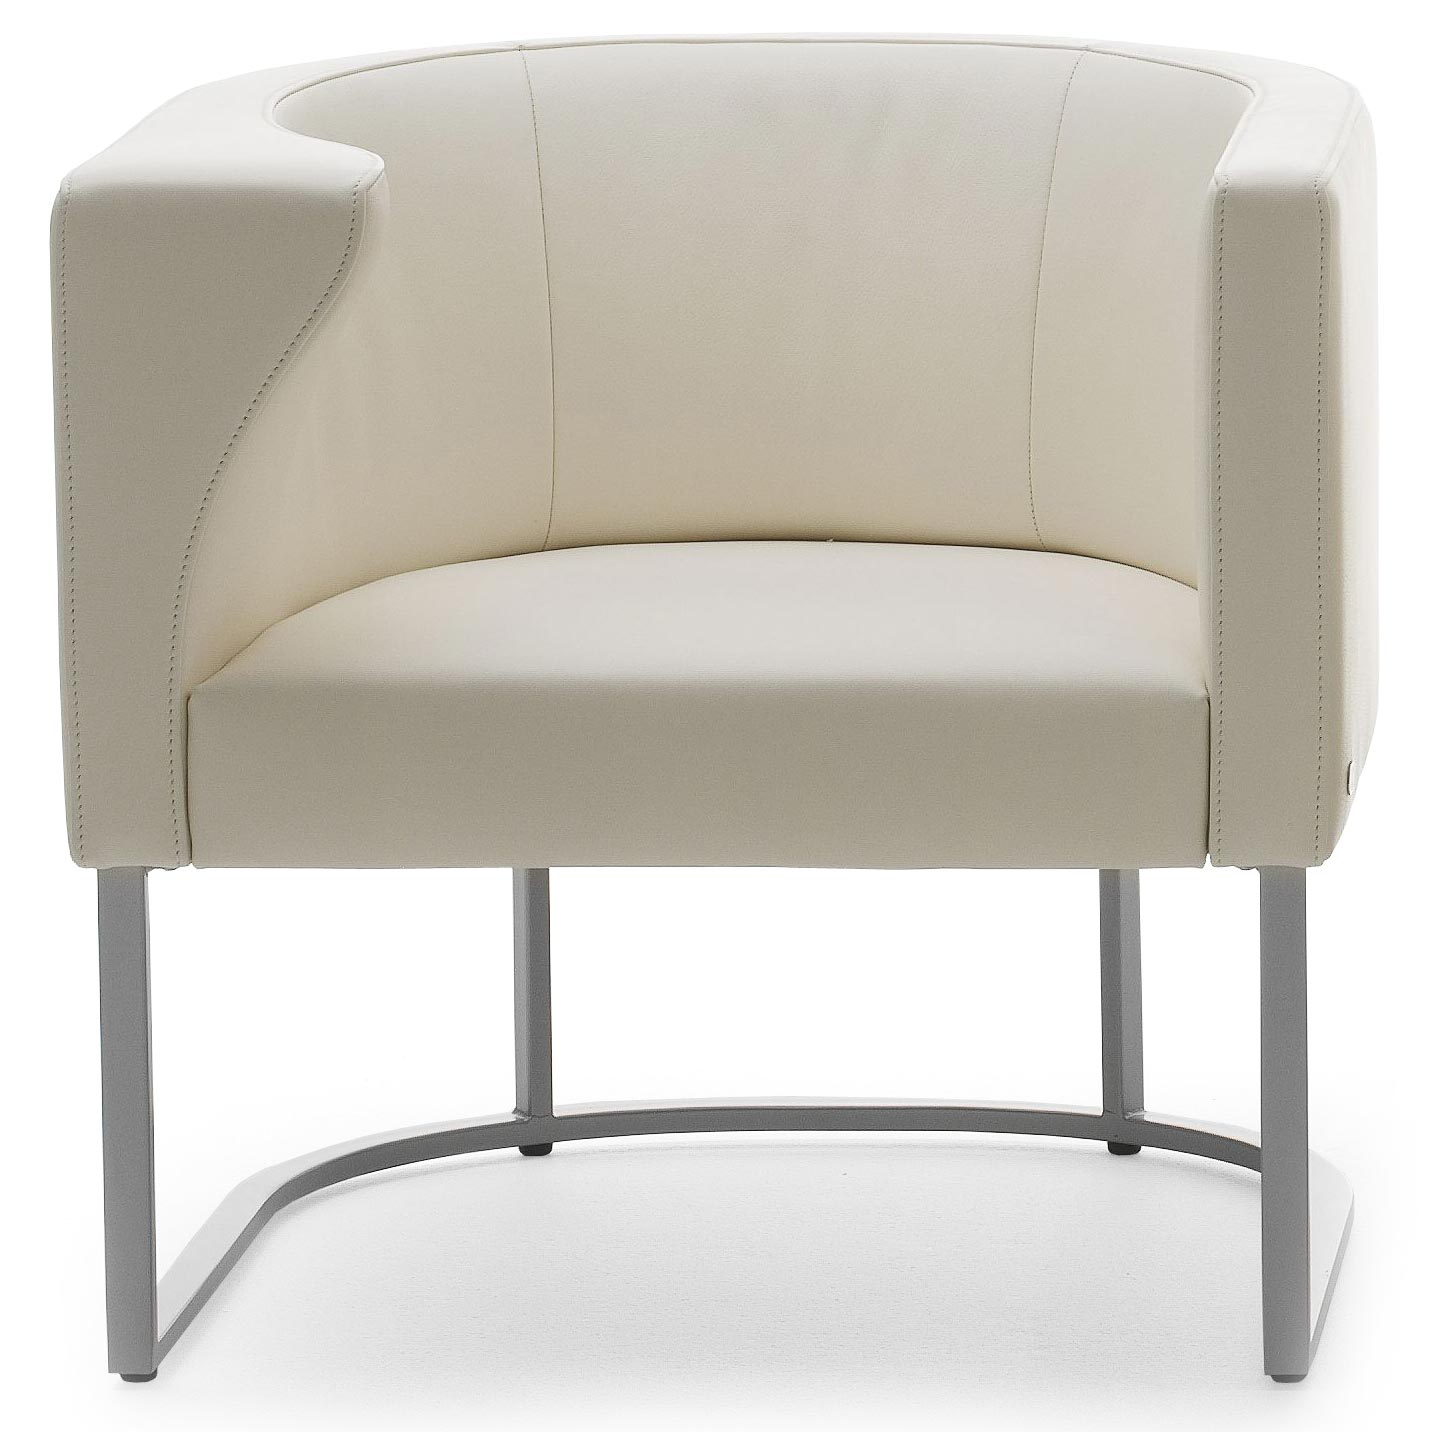 de sede sessel de sede sessel ds 51 einrichtungsh user h ls schwelm de sede ds 51 sessel de. Black Bedroom Furniture Sets. Home Design Ideas